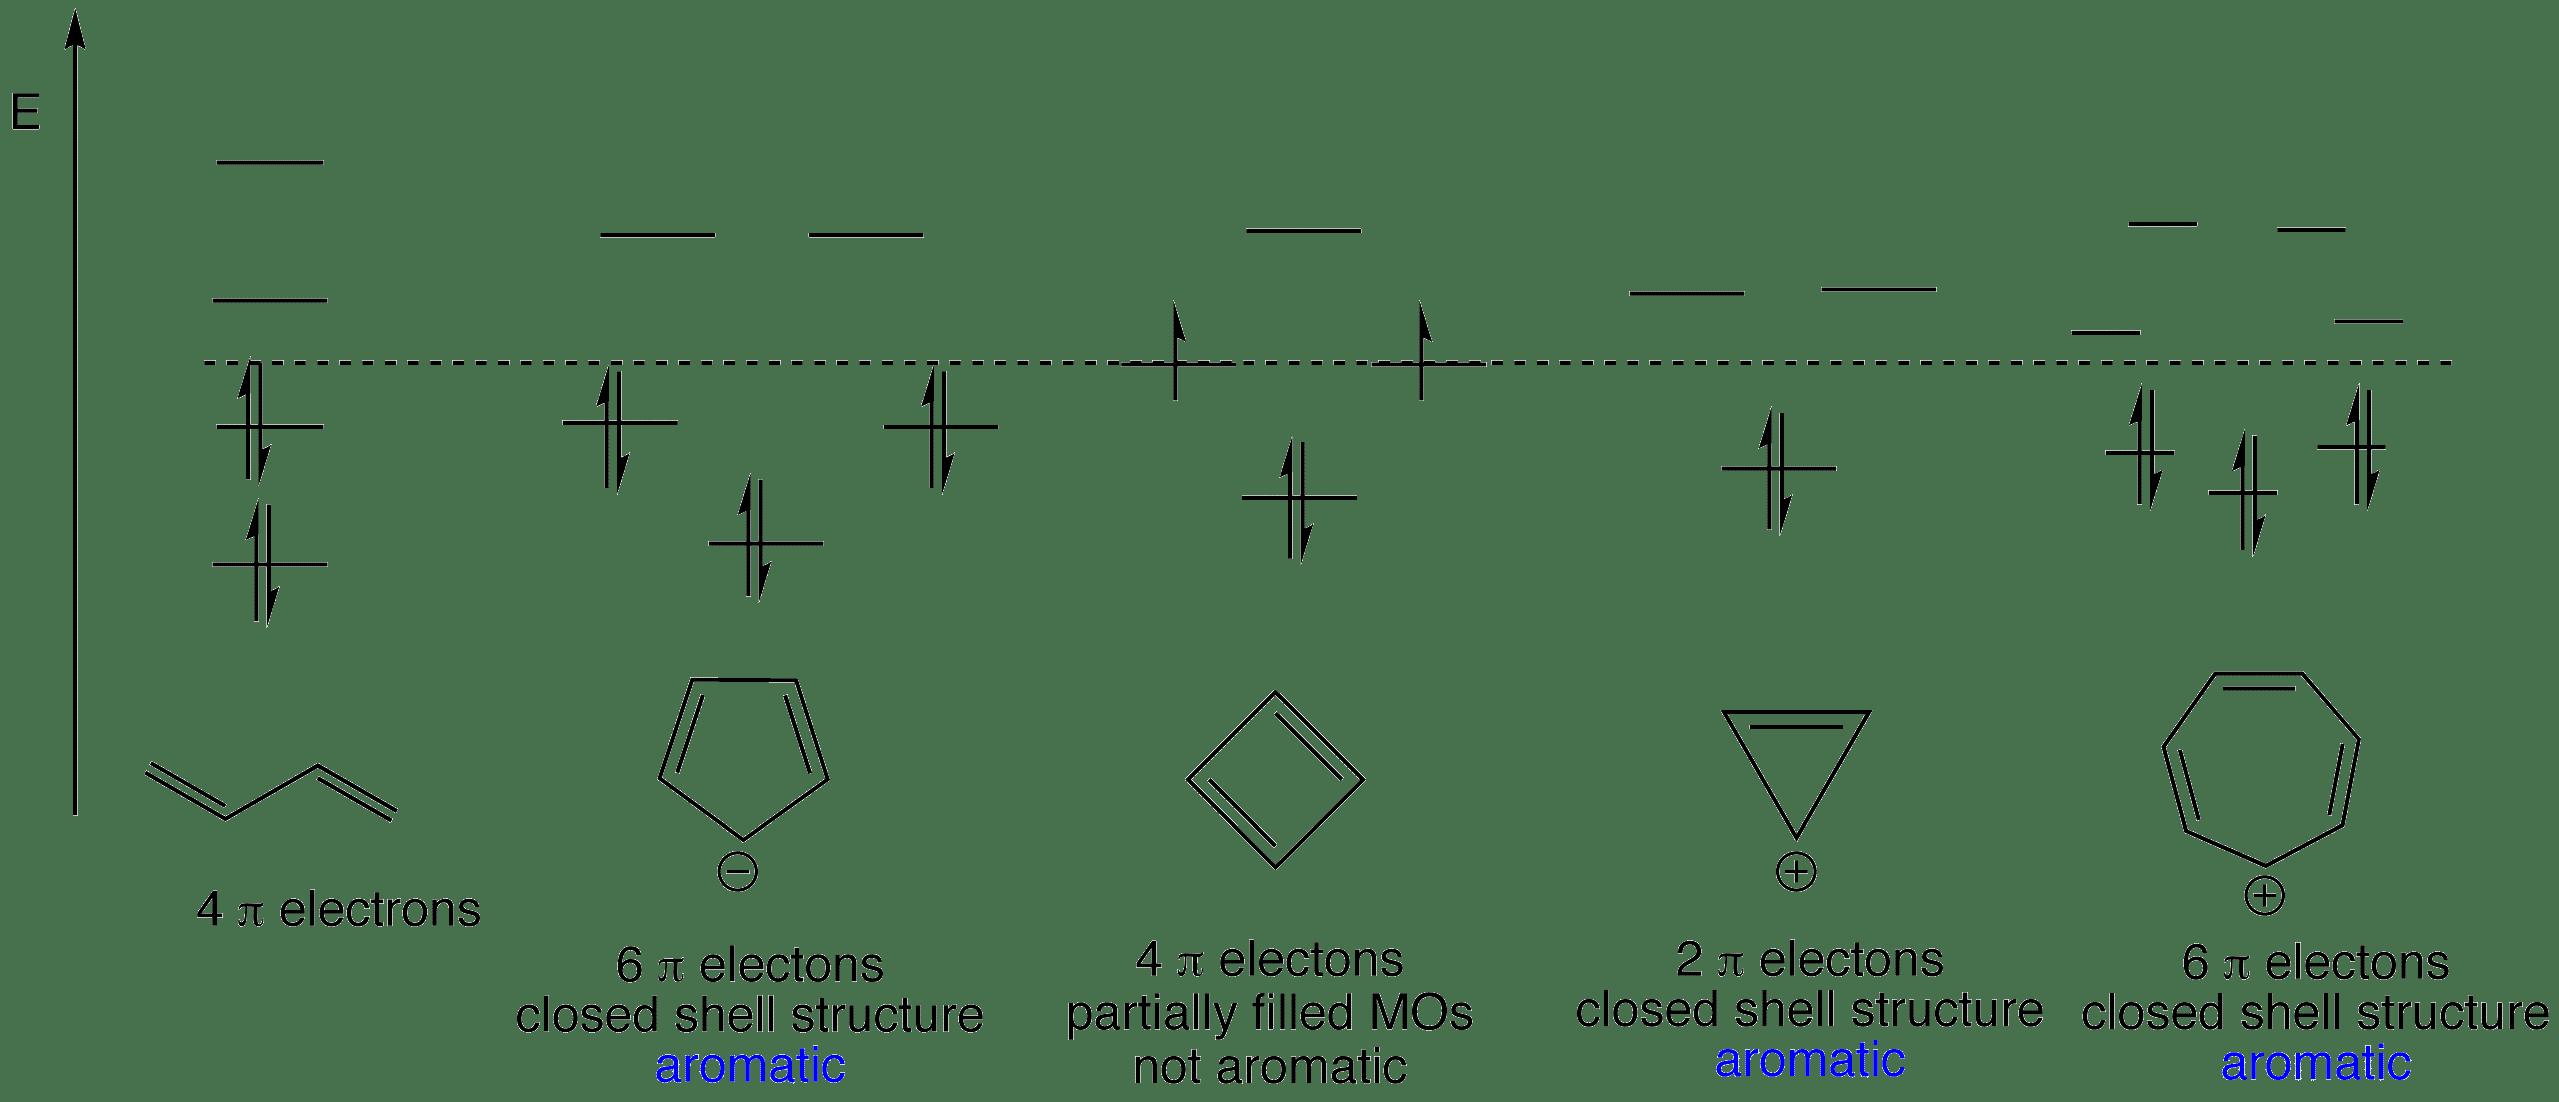 butadiene cyclopentadienyl anion cyclobutadiene cyclopropyl cation cycloheptatrienyl cation